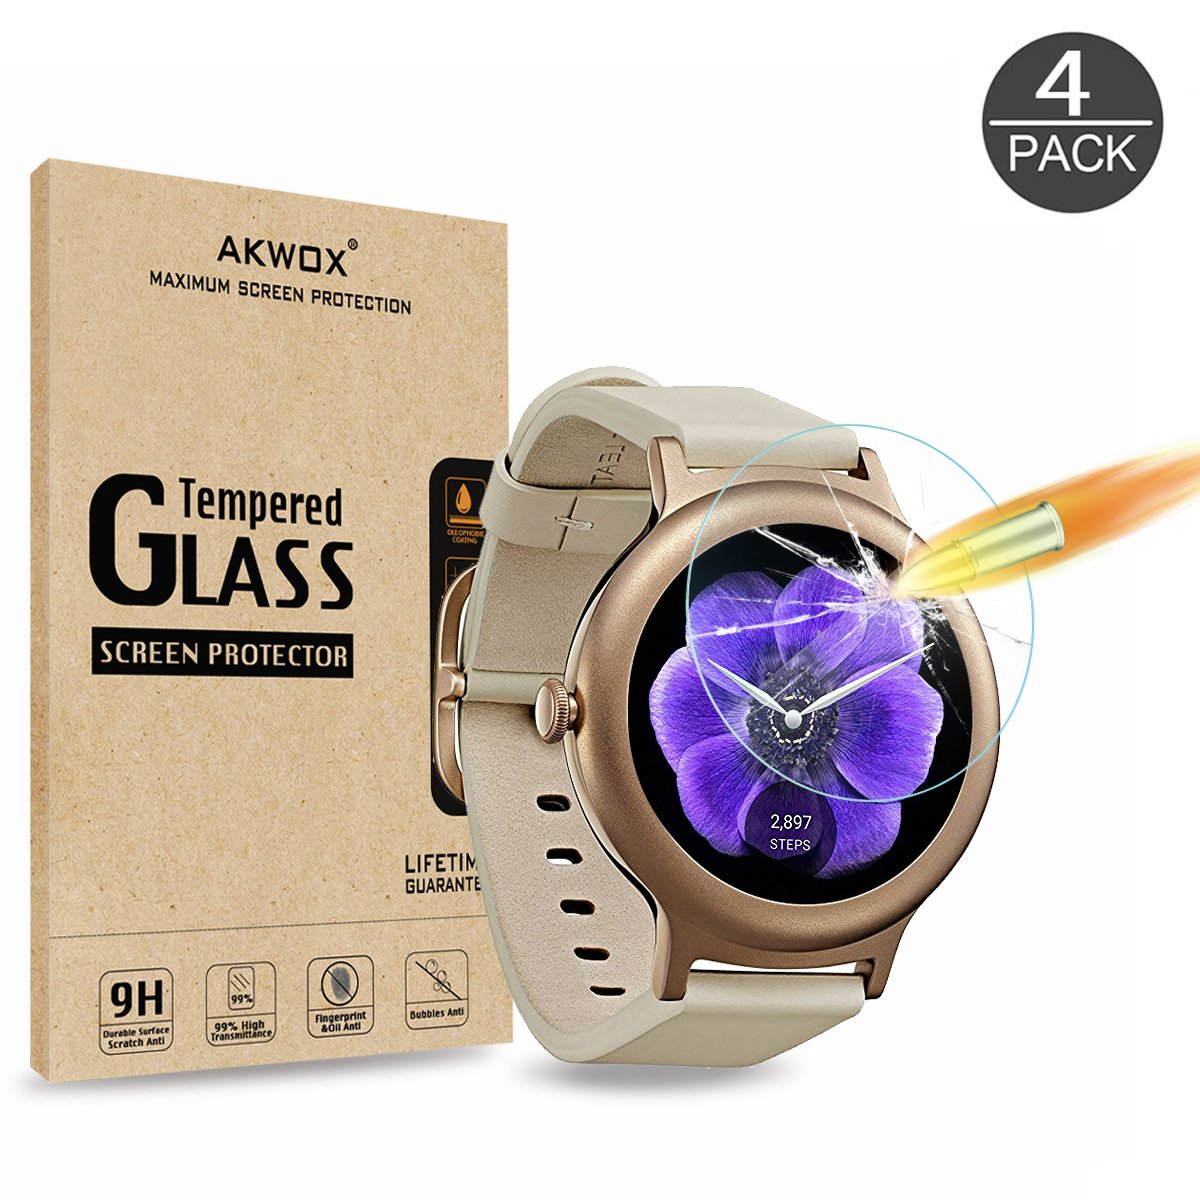 Vidrio Protector para Lg Watch x4 AKWOX -78SMHTZY